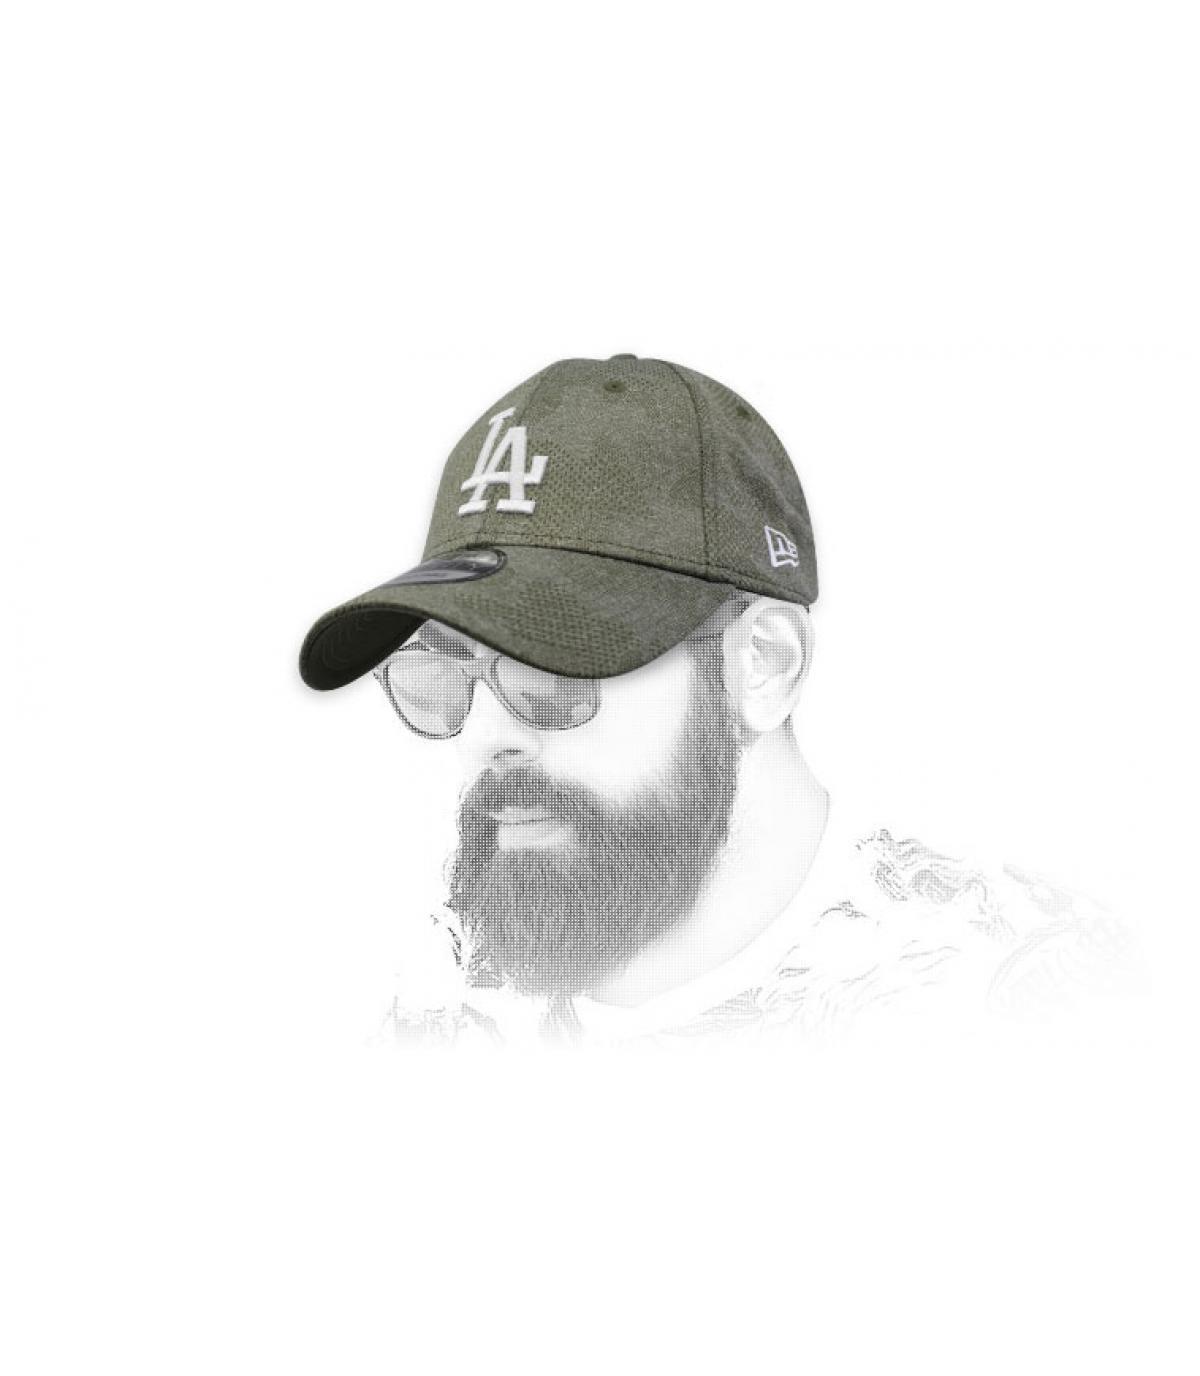 casquette LA vert blanc